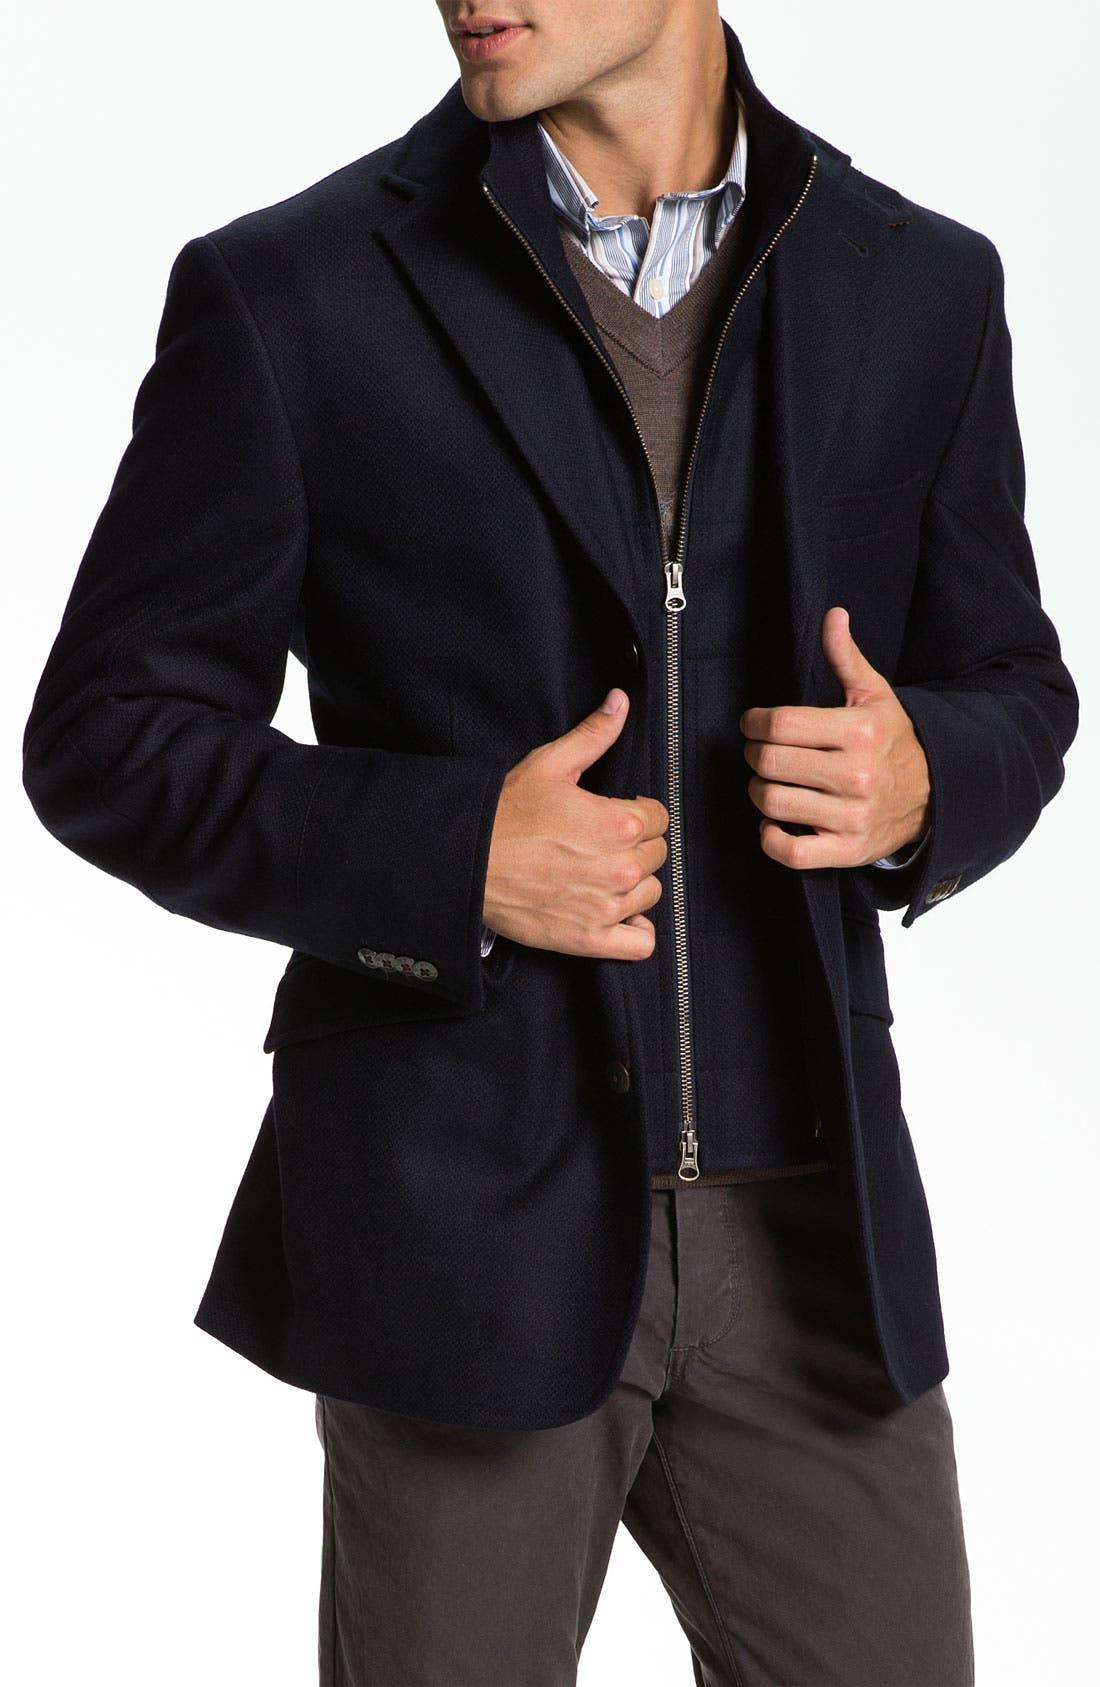 Main Image - Kroon 'Ritchie' Wool & Cashmere Blazer Style Coat